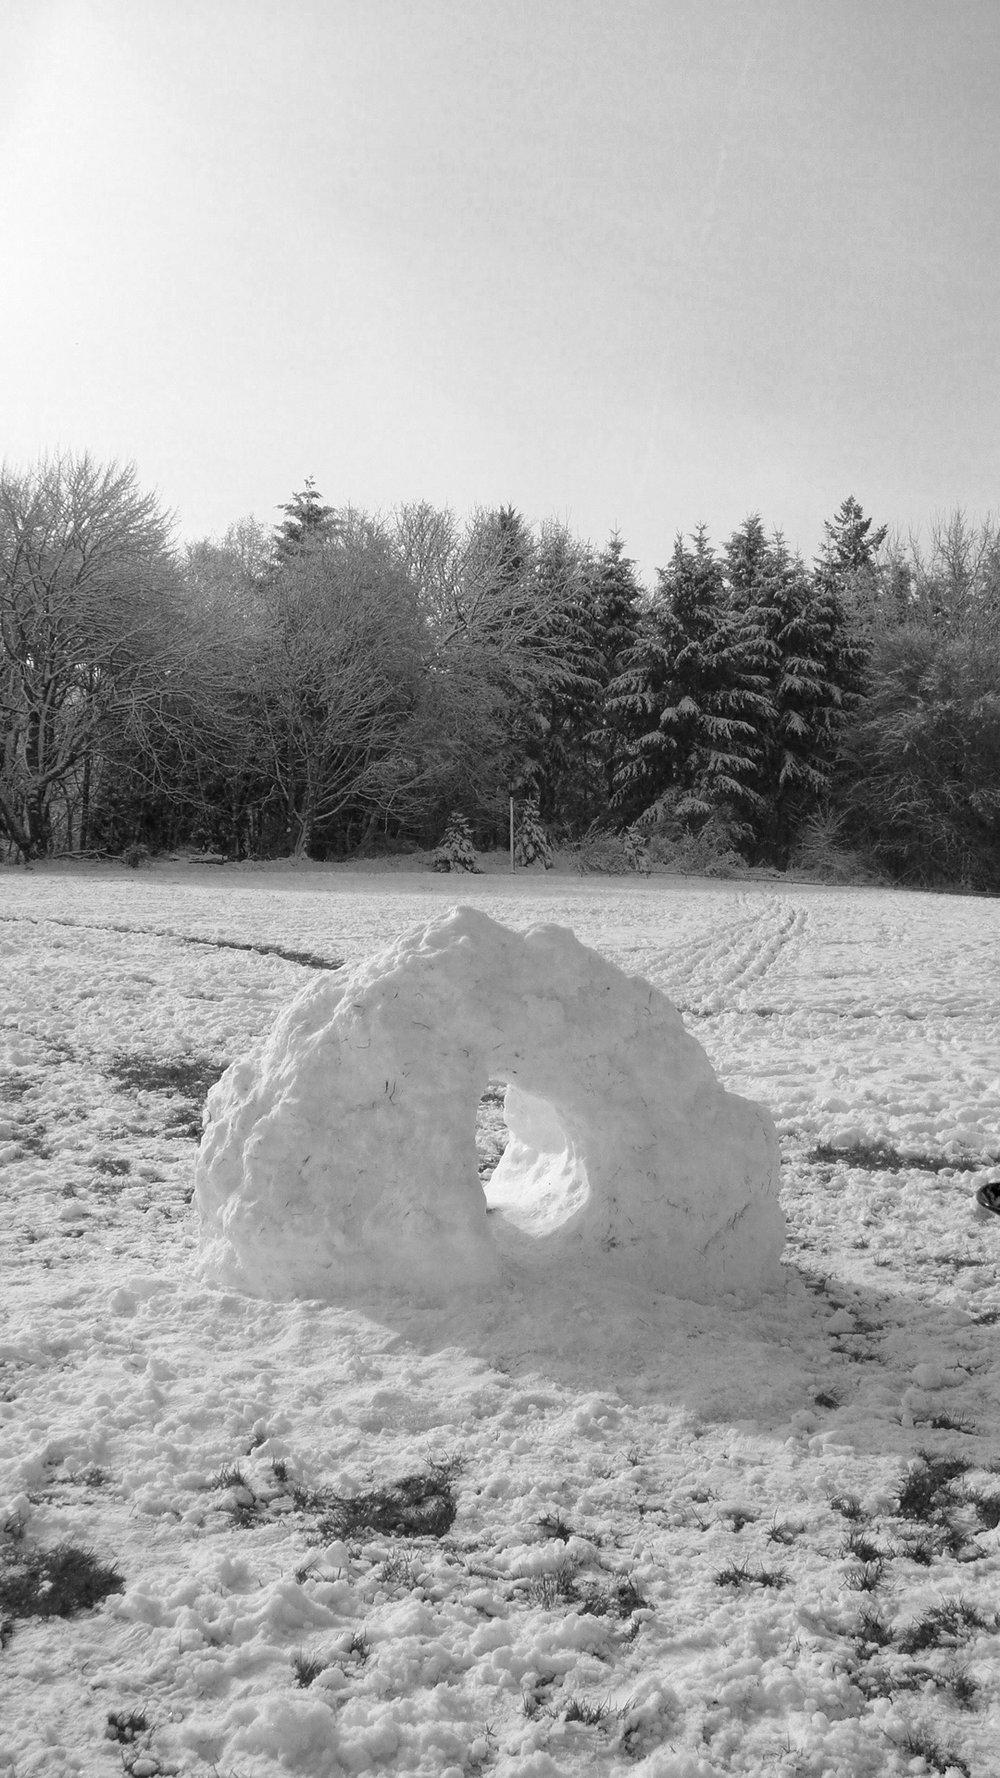 snow_donut.jpg